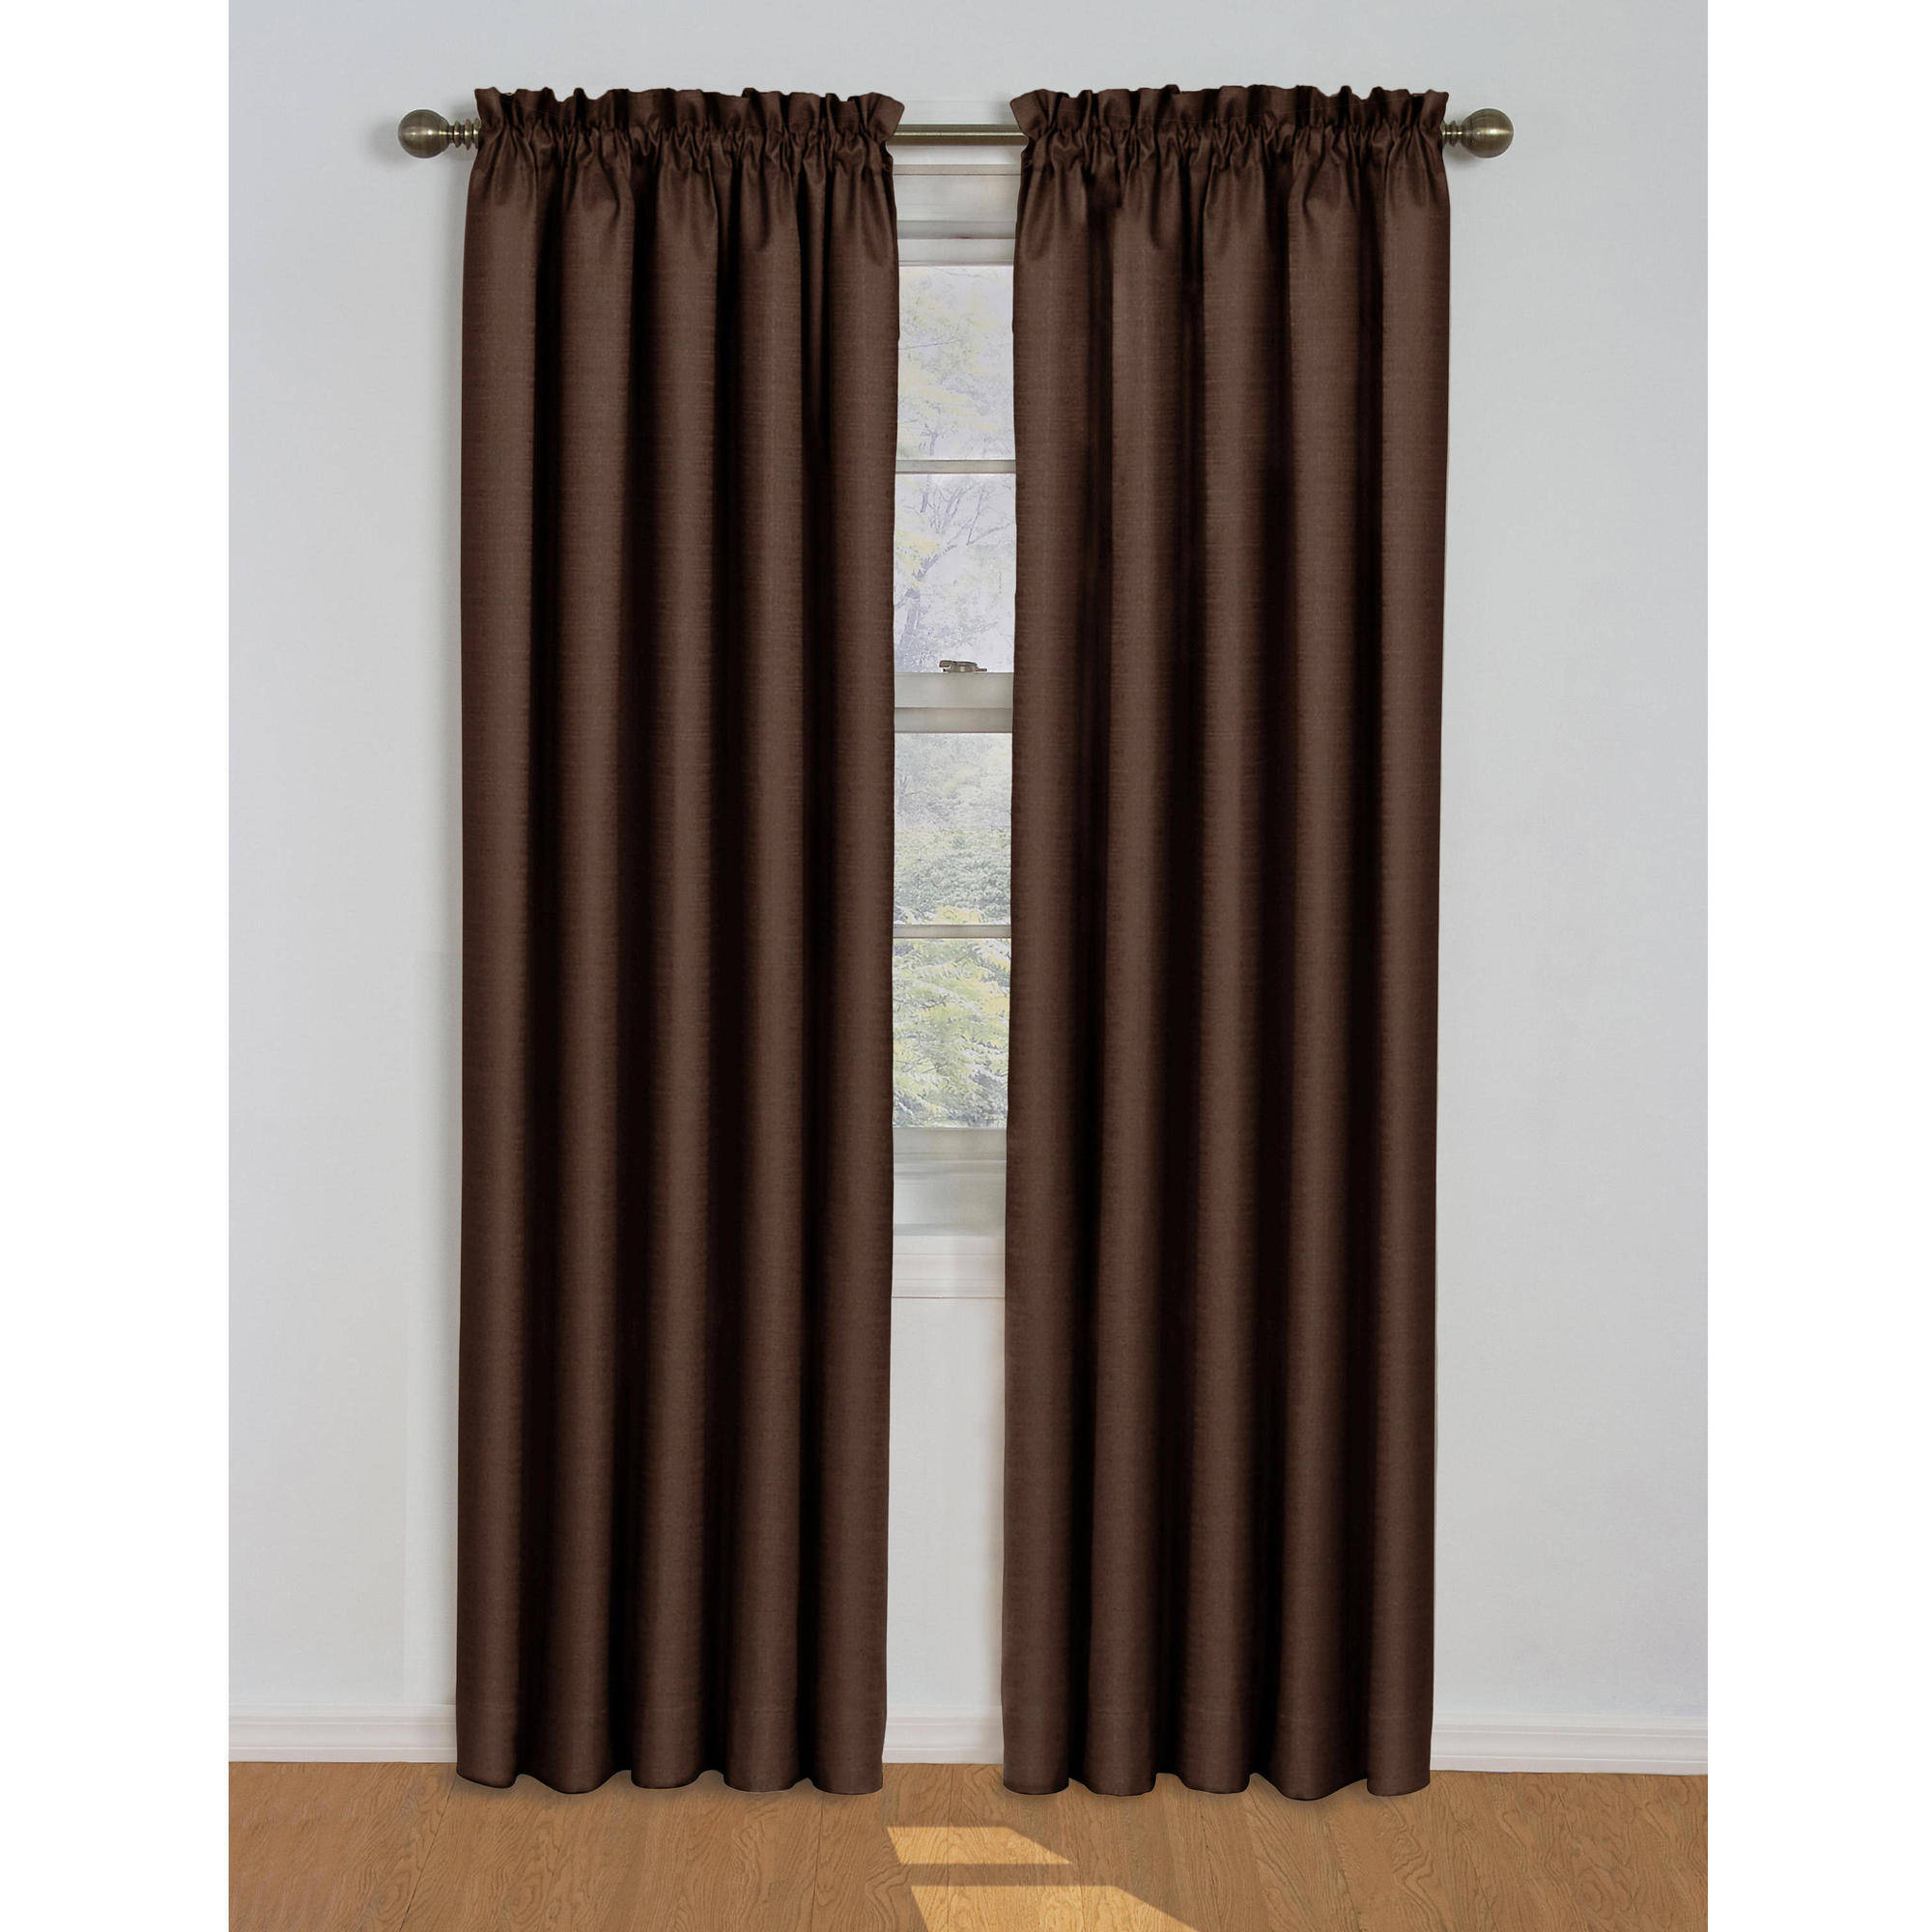 Eclipse Samara Blackout Energy-Efficient Thermal Curtain Panel